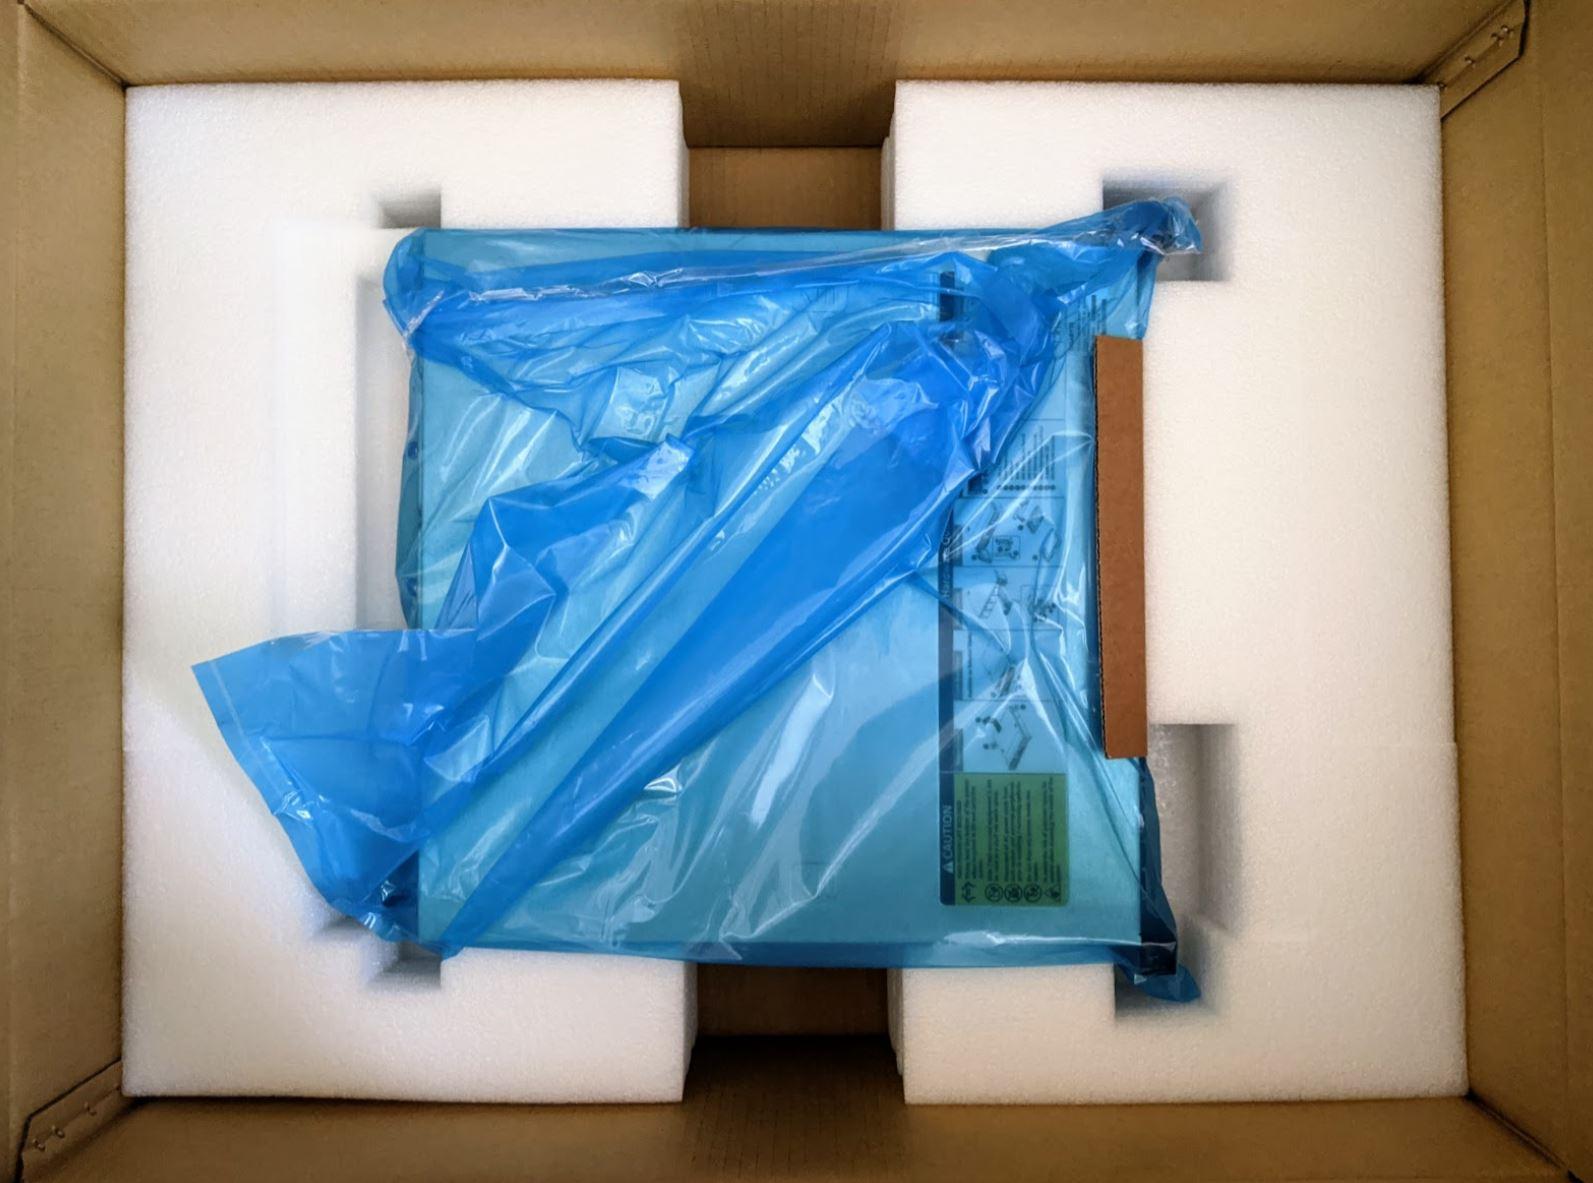 Gigabyte E251 U70 In Shipping Box